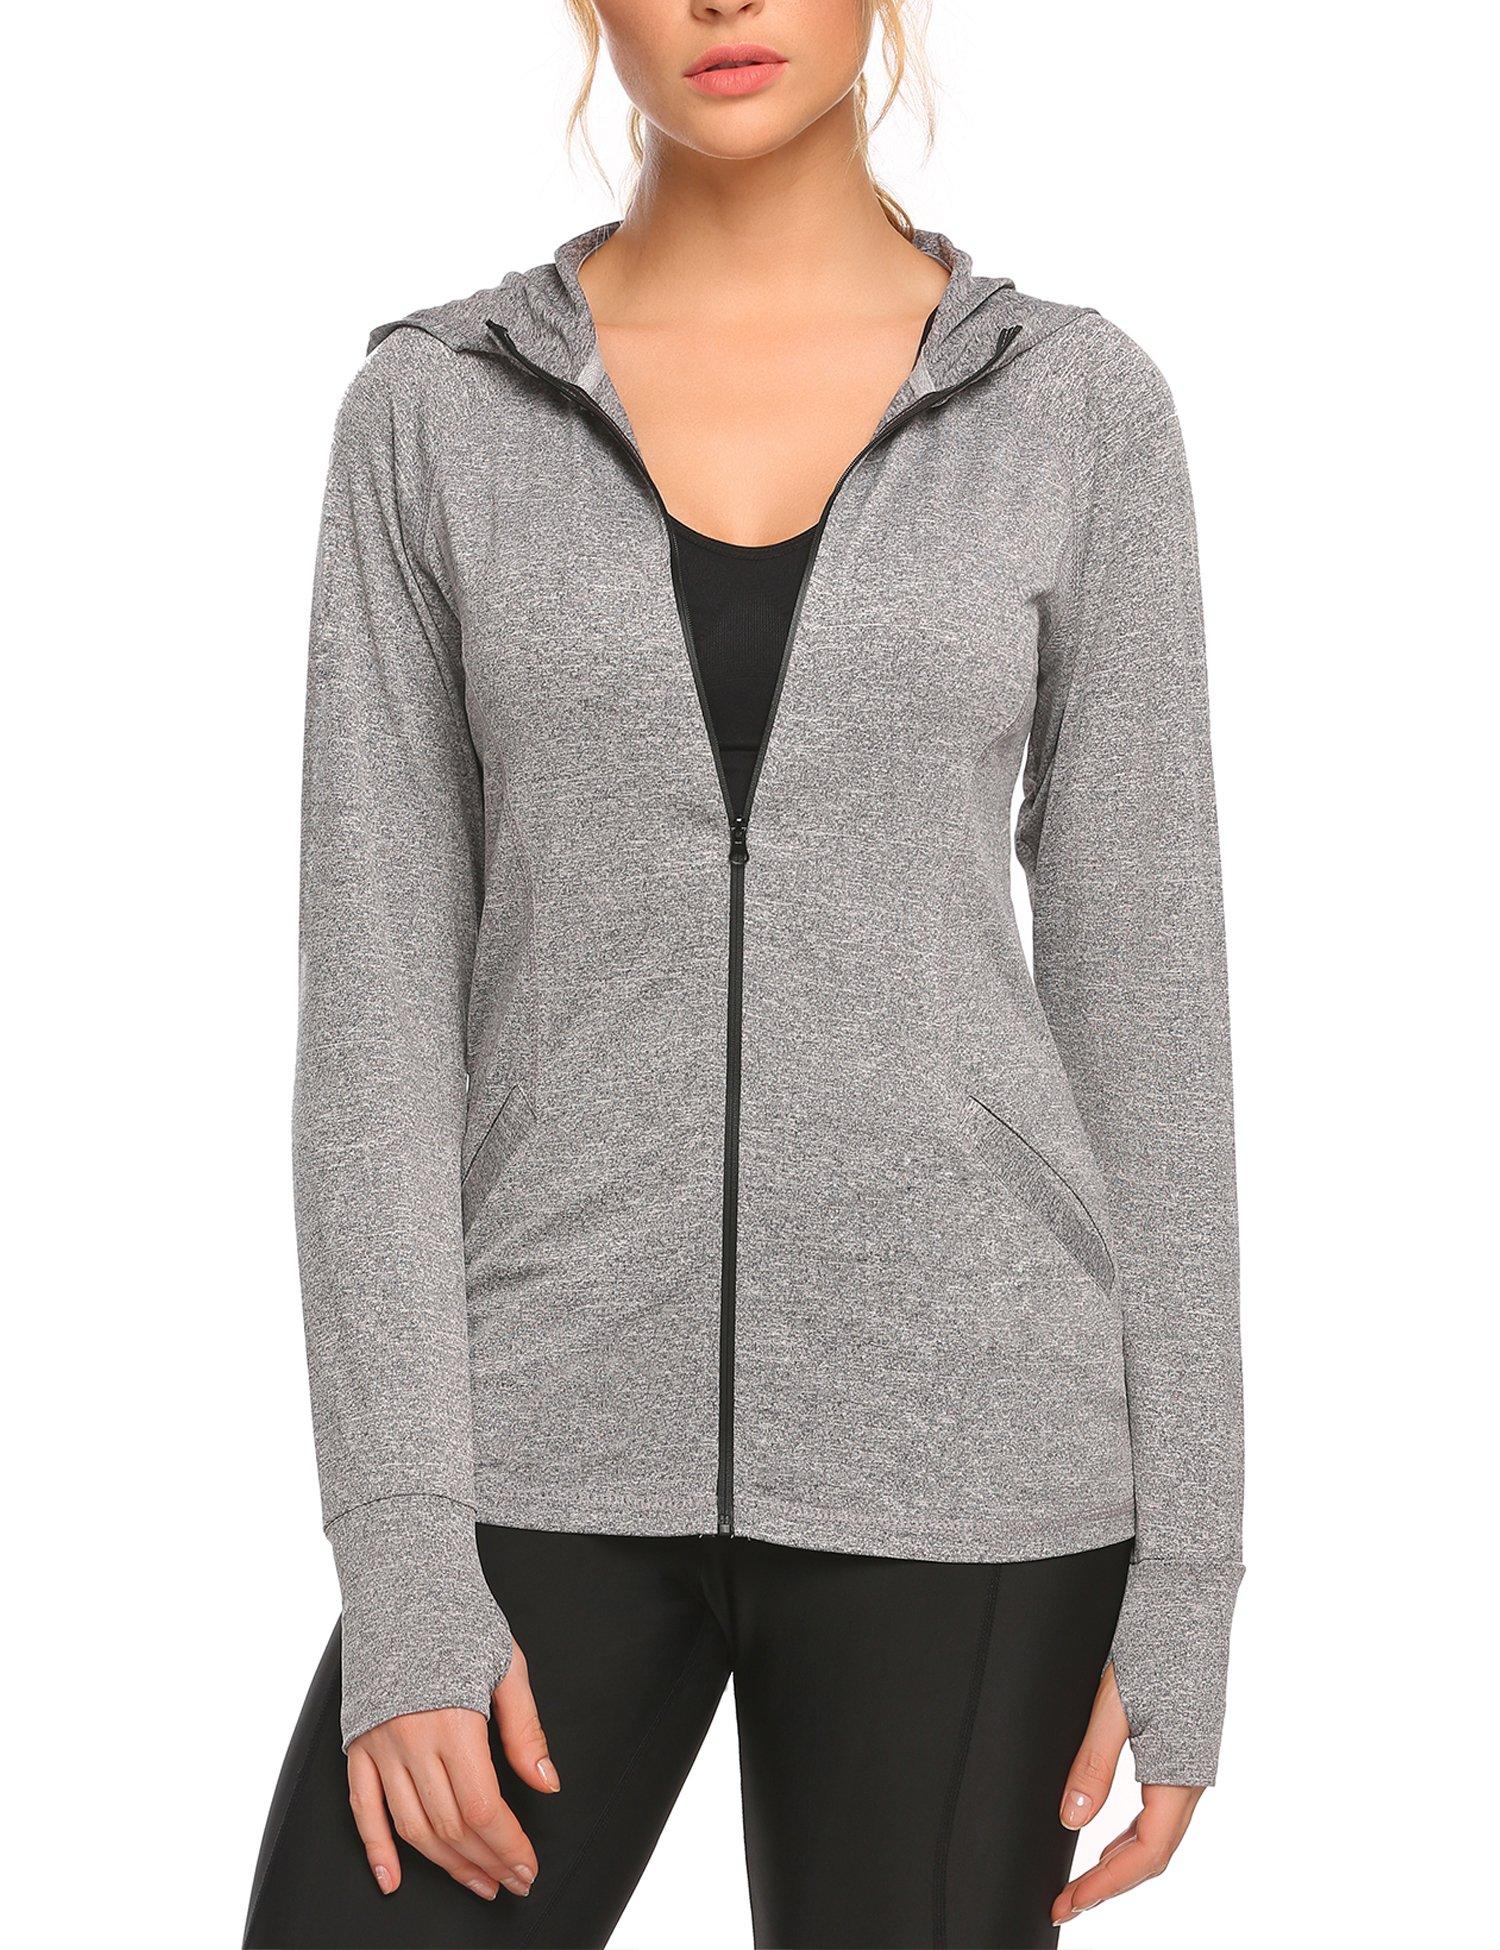 Women's Running Sports Jackets Full-zip Hoodie Coat with Thumb Hole, Dark Grey, Small